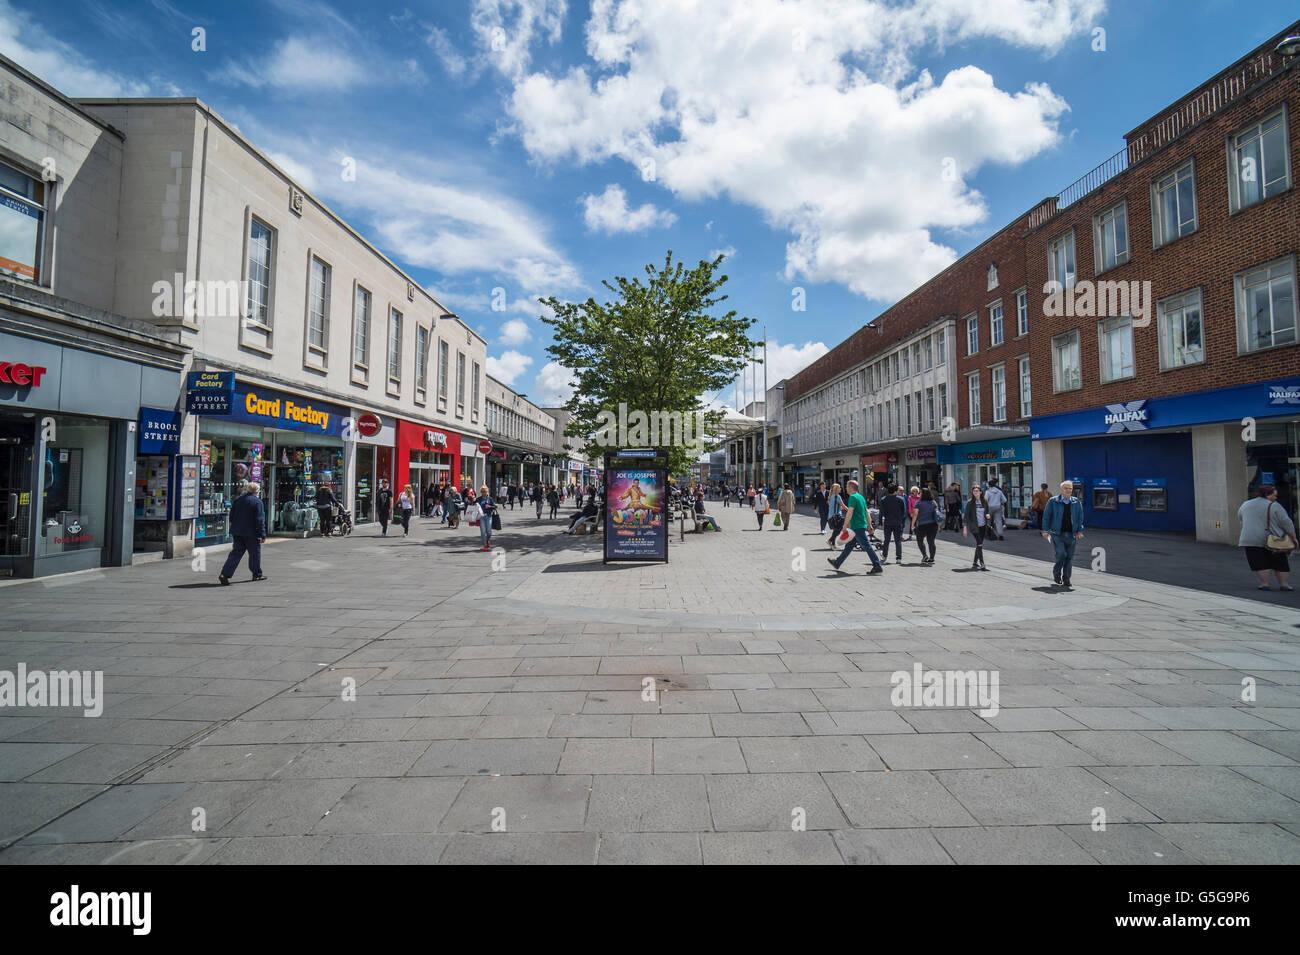 Southampton shopping precinct - Stock Image